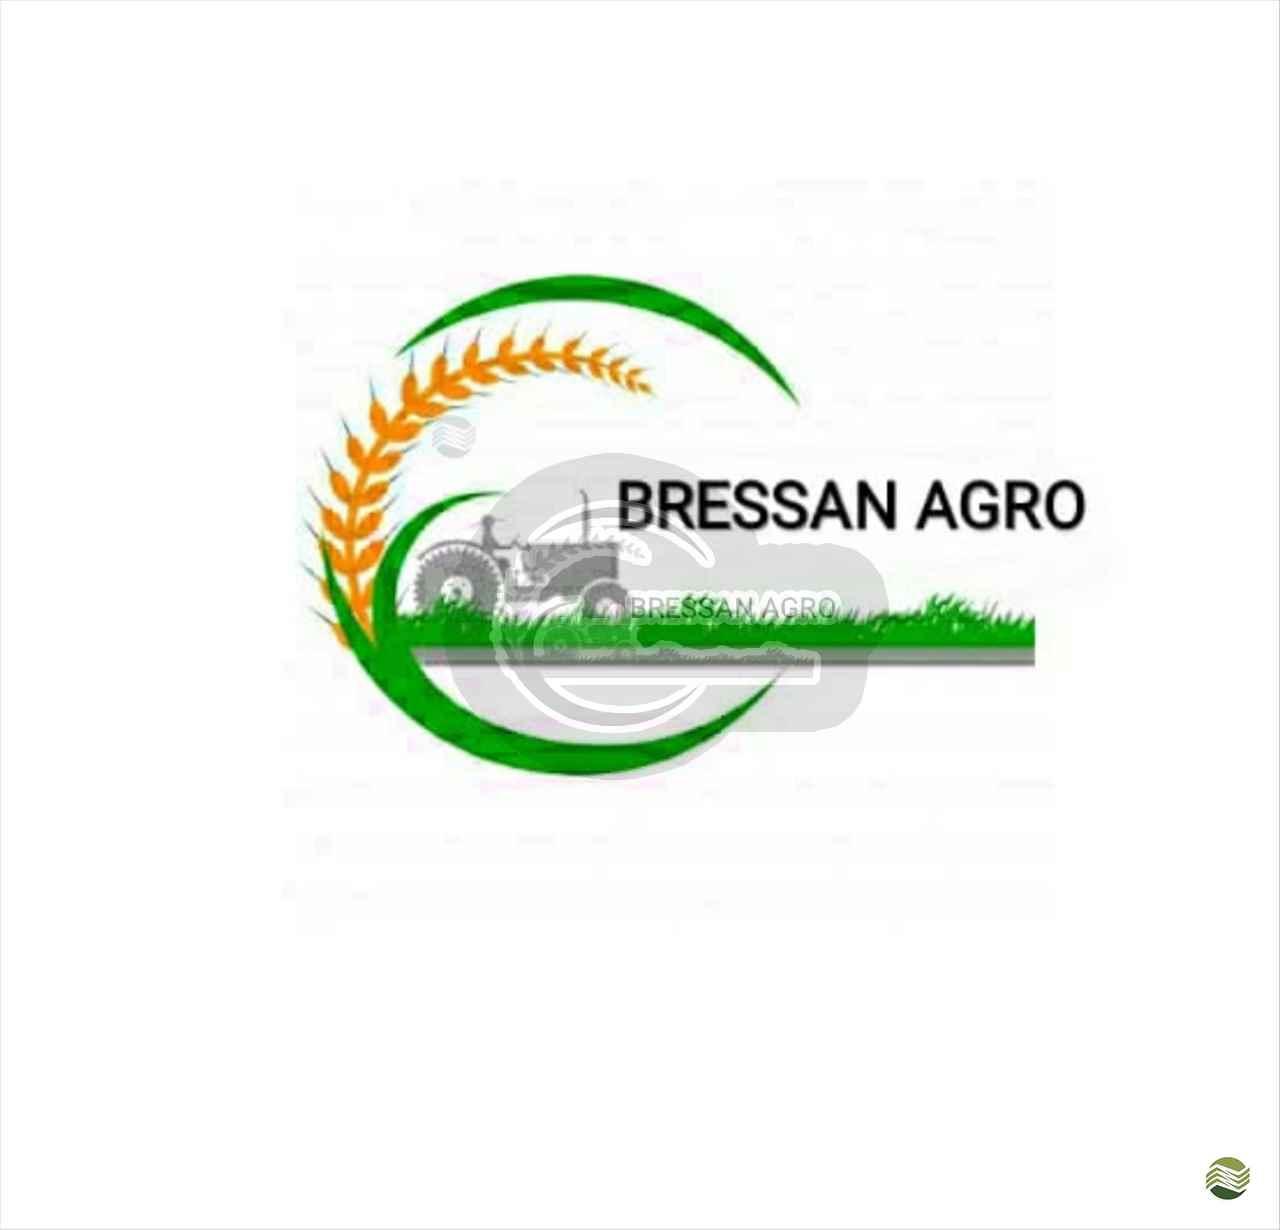 IMOVEIS IMÓVEIS FAZENDAS Bressan Agro VARZEA GRANDE MATO GROSSO MT